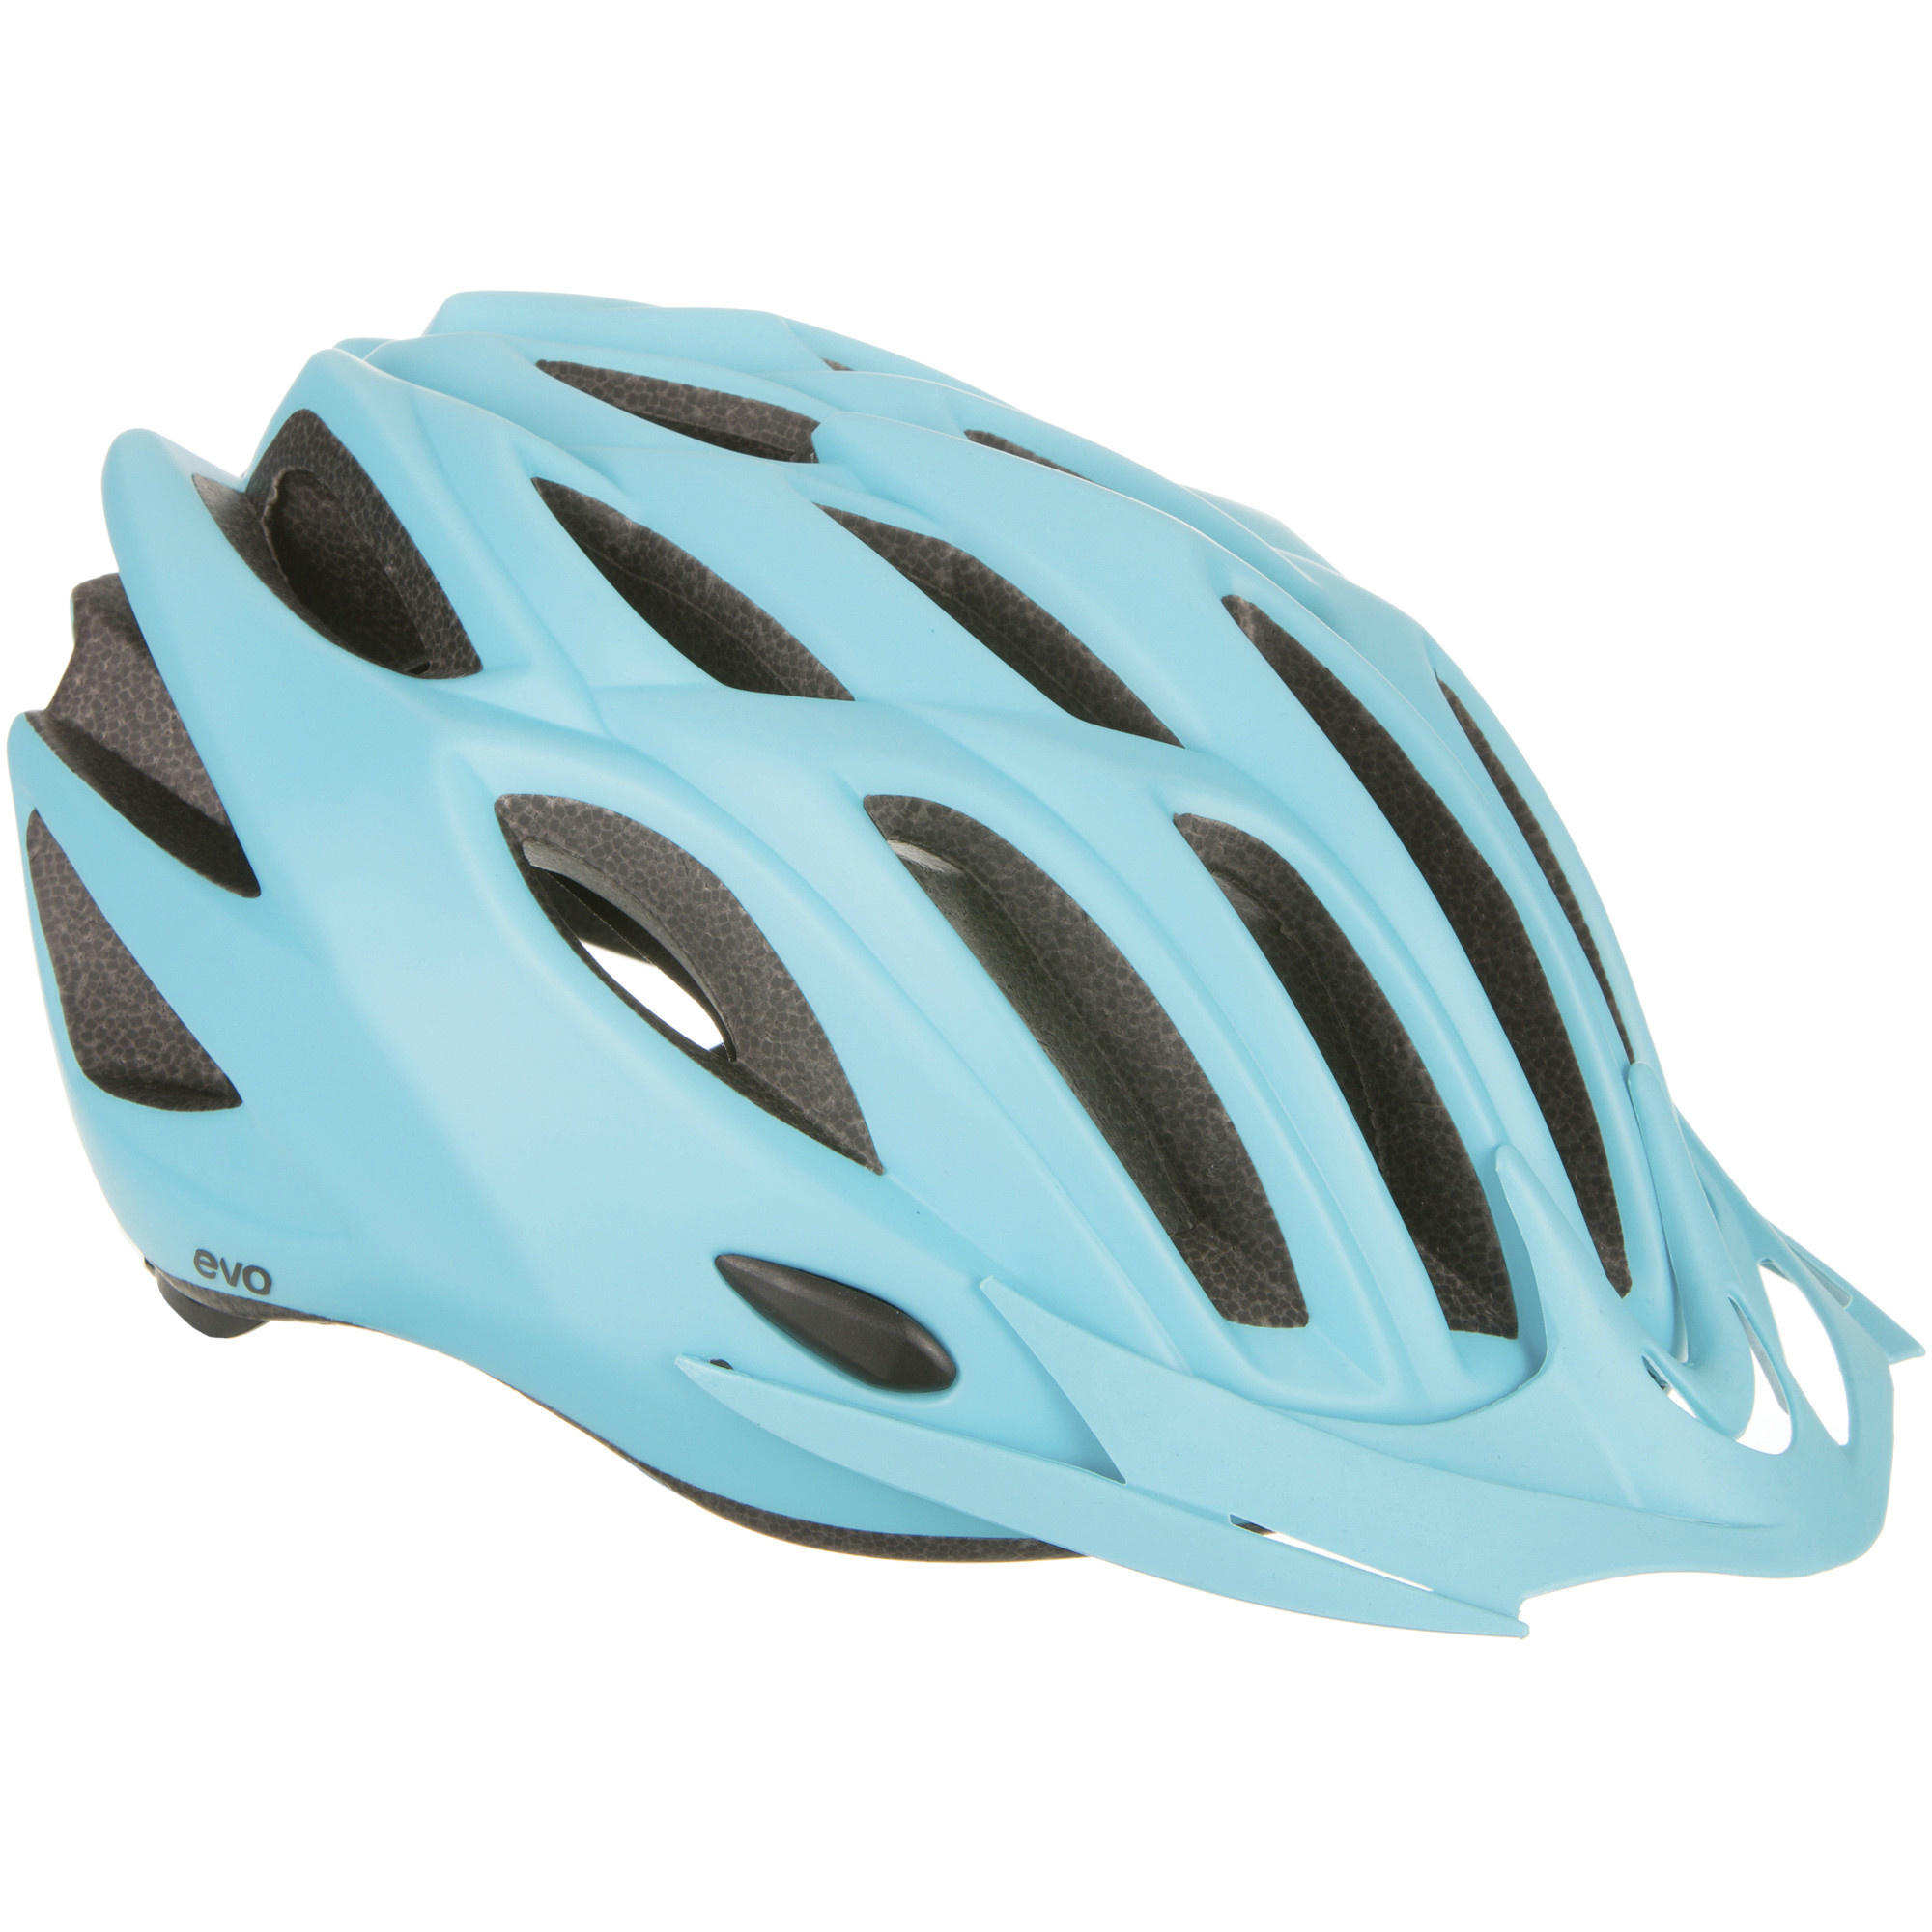 Evo Evo, Draff, Helmet, Matte Blue